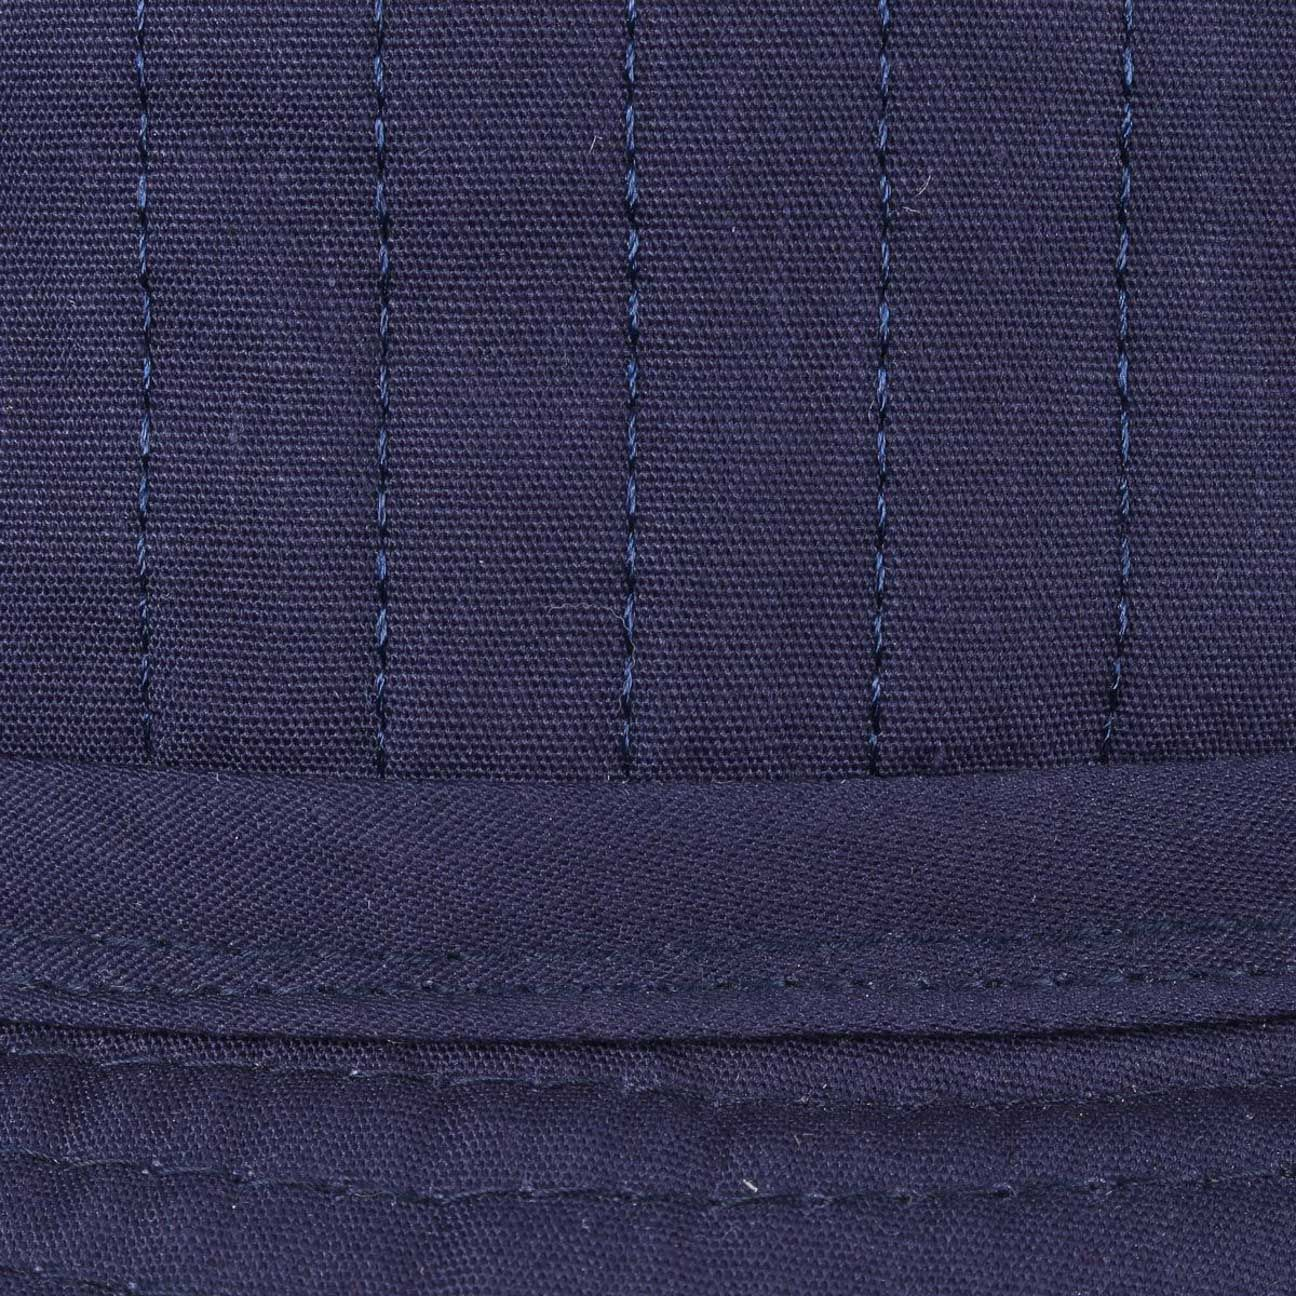 Mason Stoffhut blau